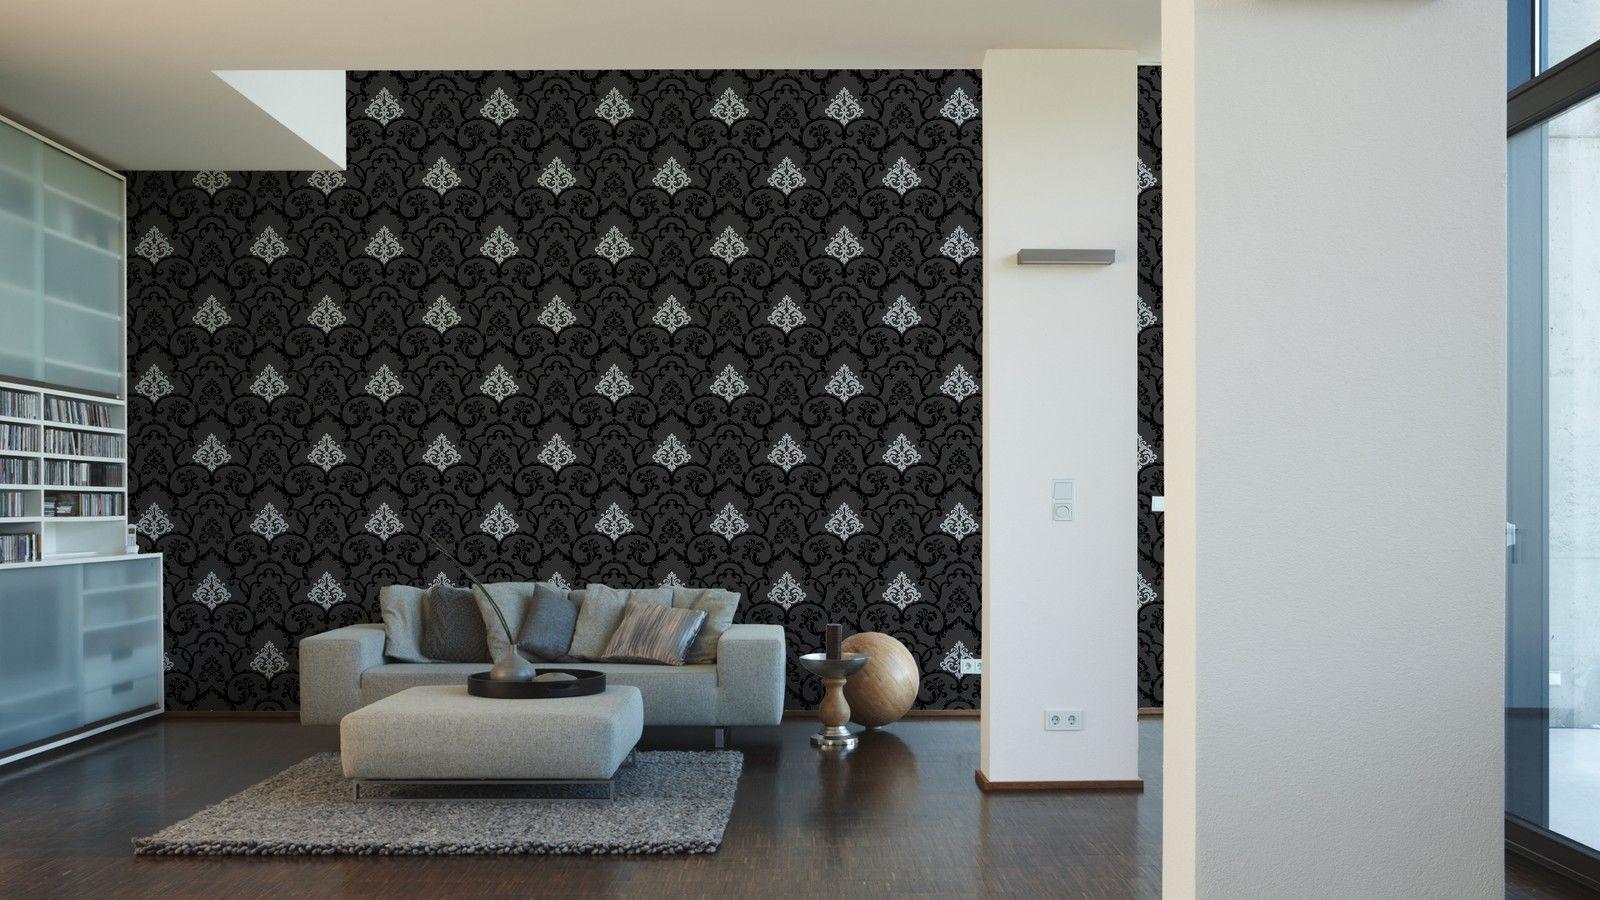 vlies tapete barock muster ornament schwarz silber glanz. Black Bedroom Furniture Sets. Home Design Ideas